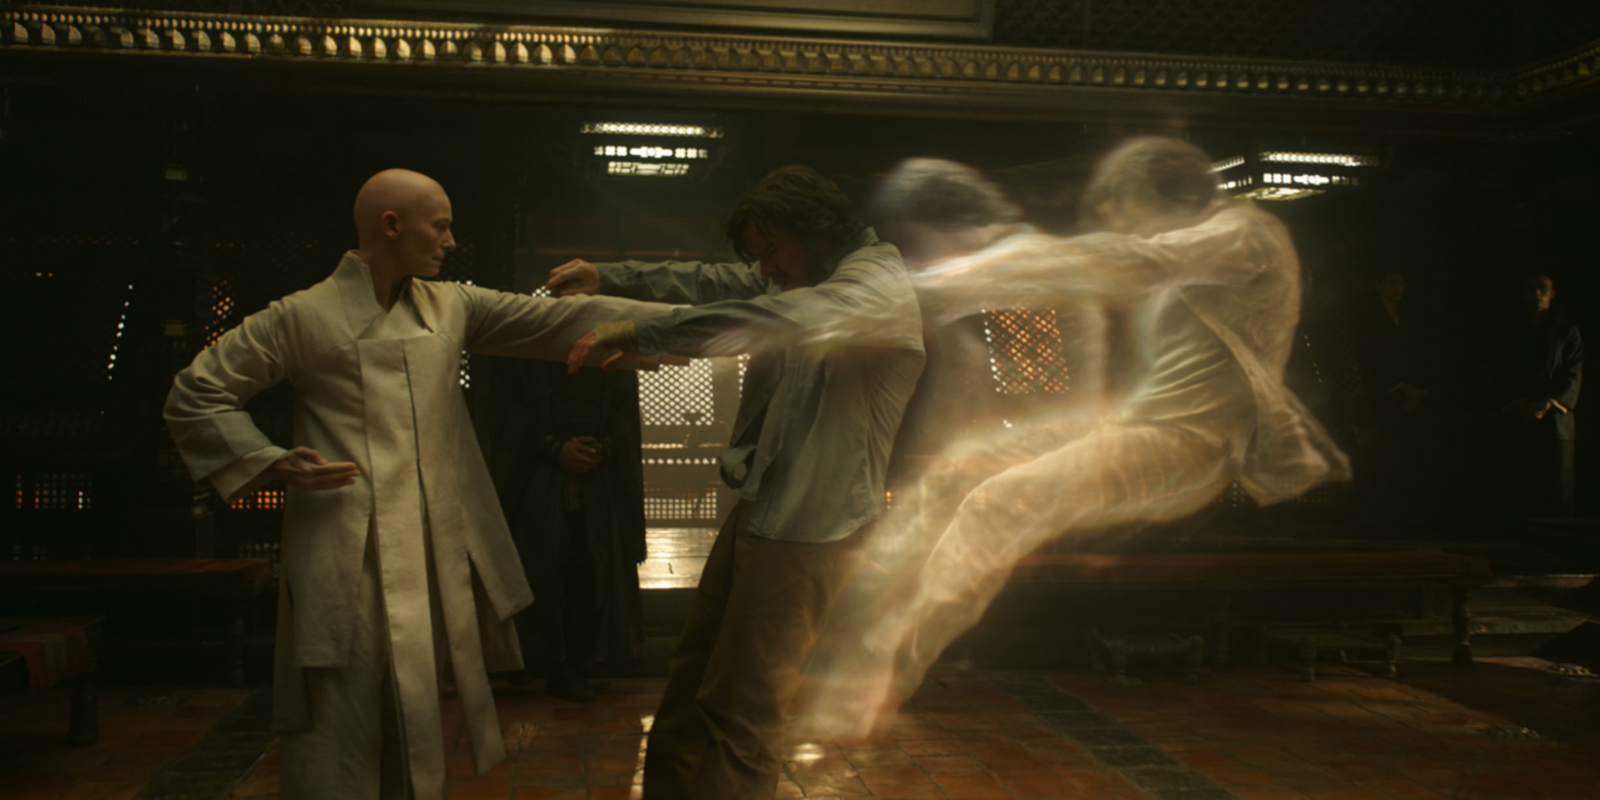 Pada scene inilah, Doctor Strange mulai mempercayai metafisika (sumber: http://static.srcdn.com/wp-content/uploads/doctor-strange-movie-tilda-swinton-benedict-cumberbatch.jpg)